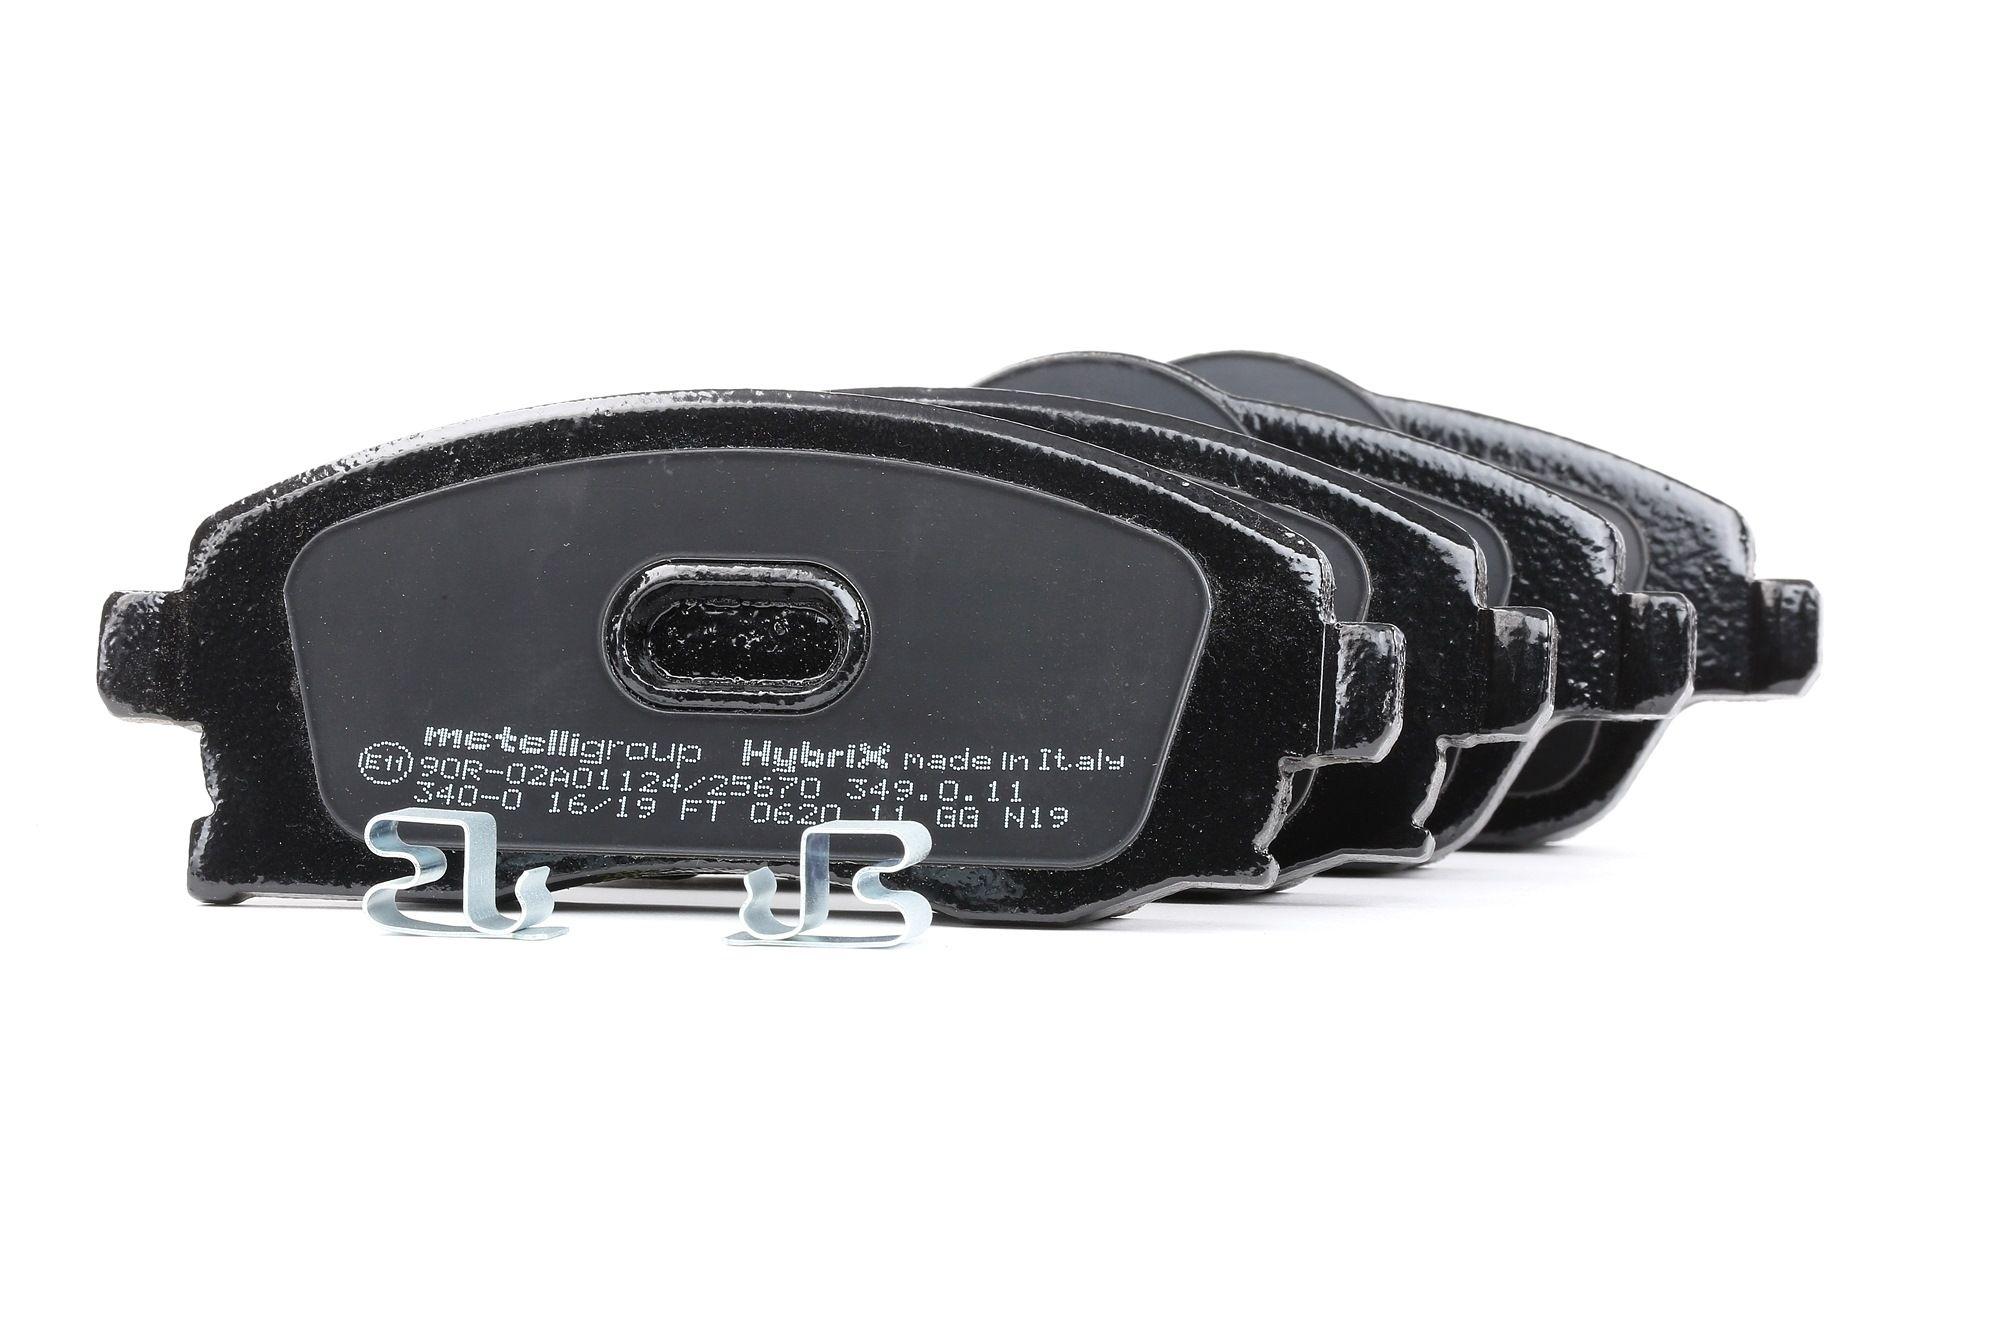 Bremsbelagsatz Opel Corsa B Pickup hinten + vorne 2003 - METELLI 22-0340-0 (Höhe 2: 55,6mm, Breite 2: 131,4mm, Dicke/Stärke 1: 17,0mm, Dicke/Stärke 2: 17,0mm)